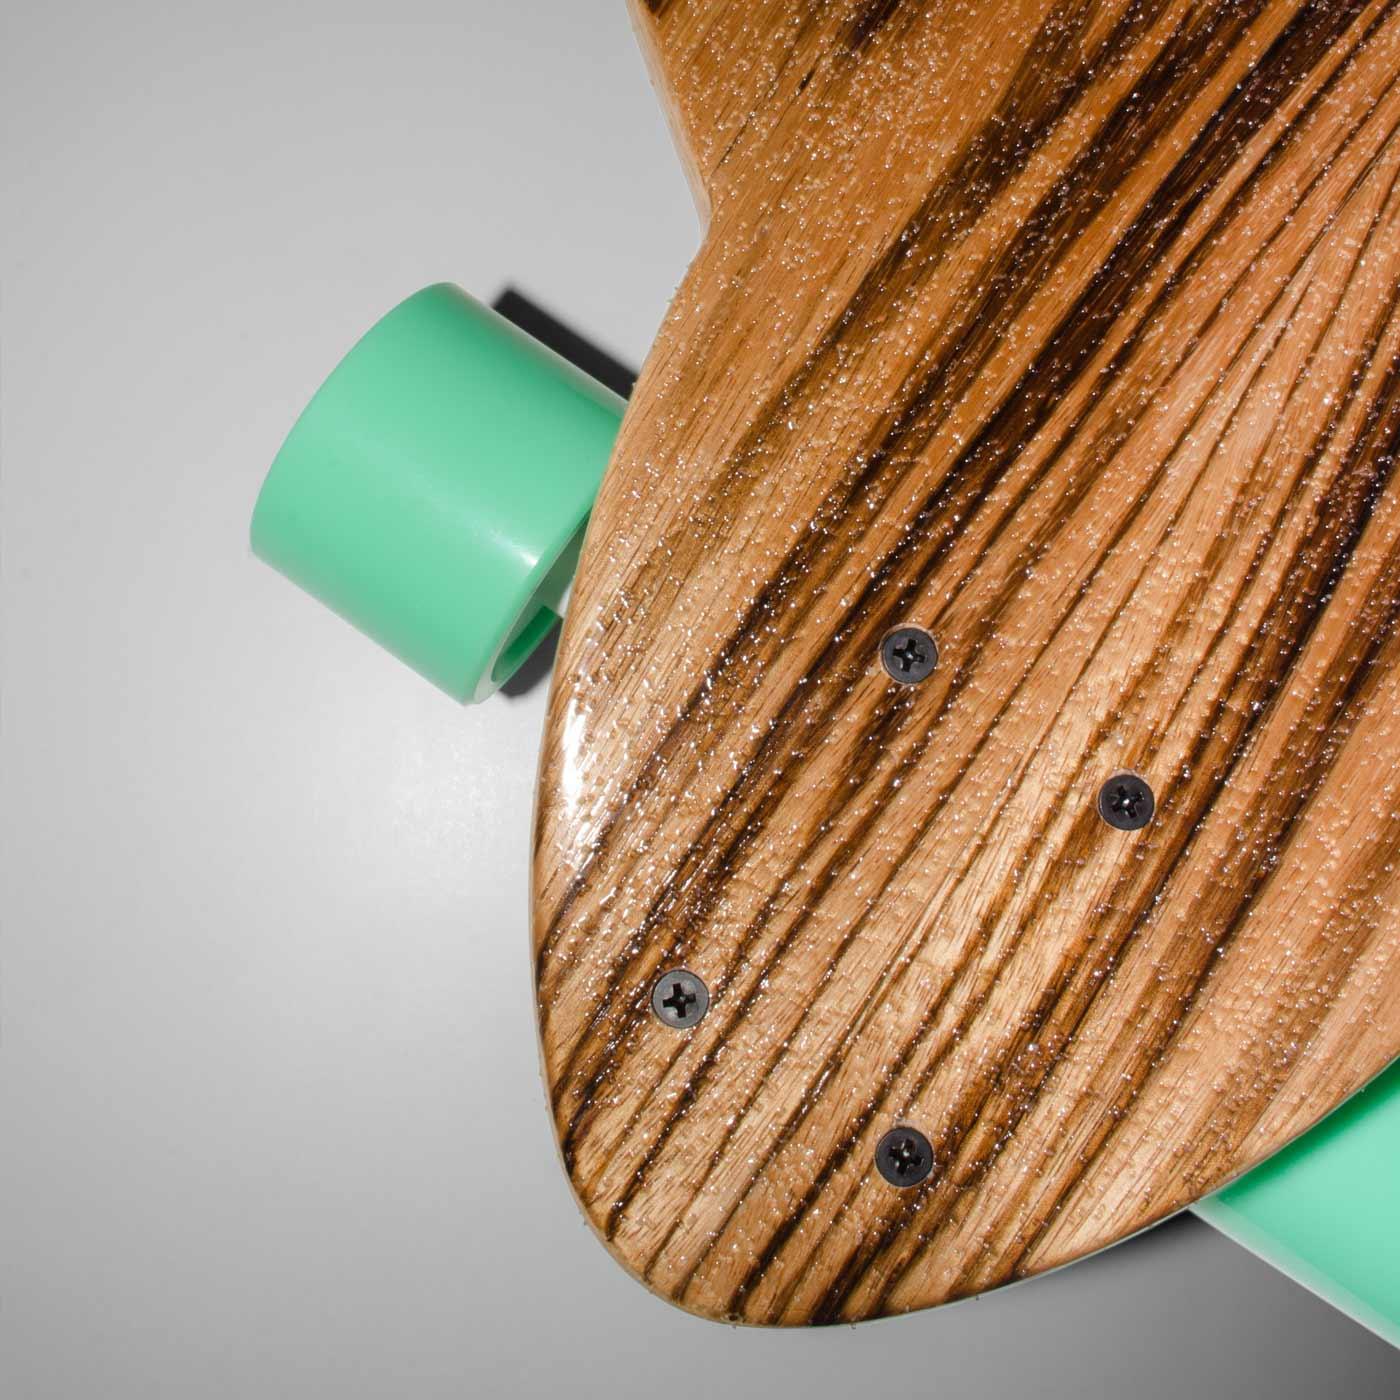 Detail of the WACH designstudio longboard front deck covered with mirrored zebra wood veneer